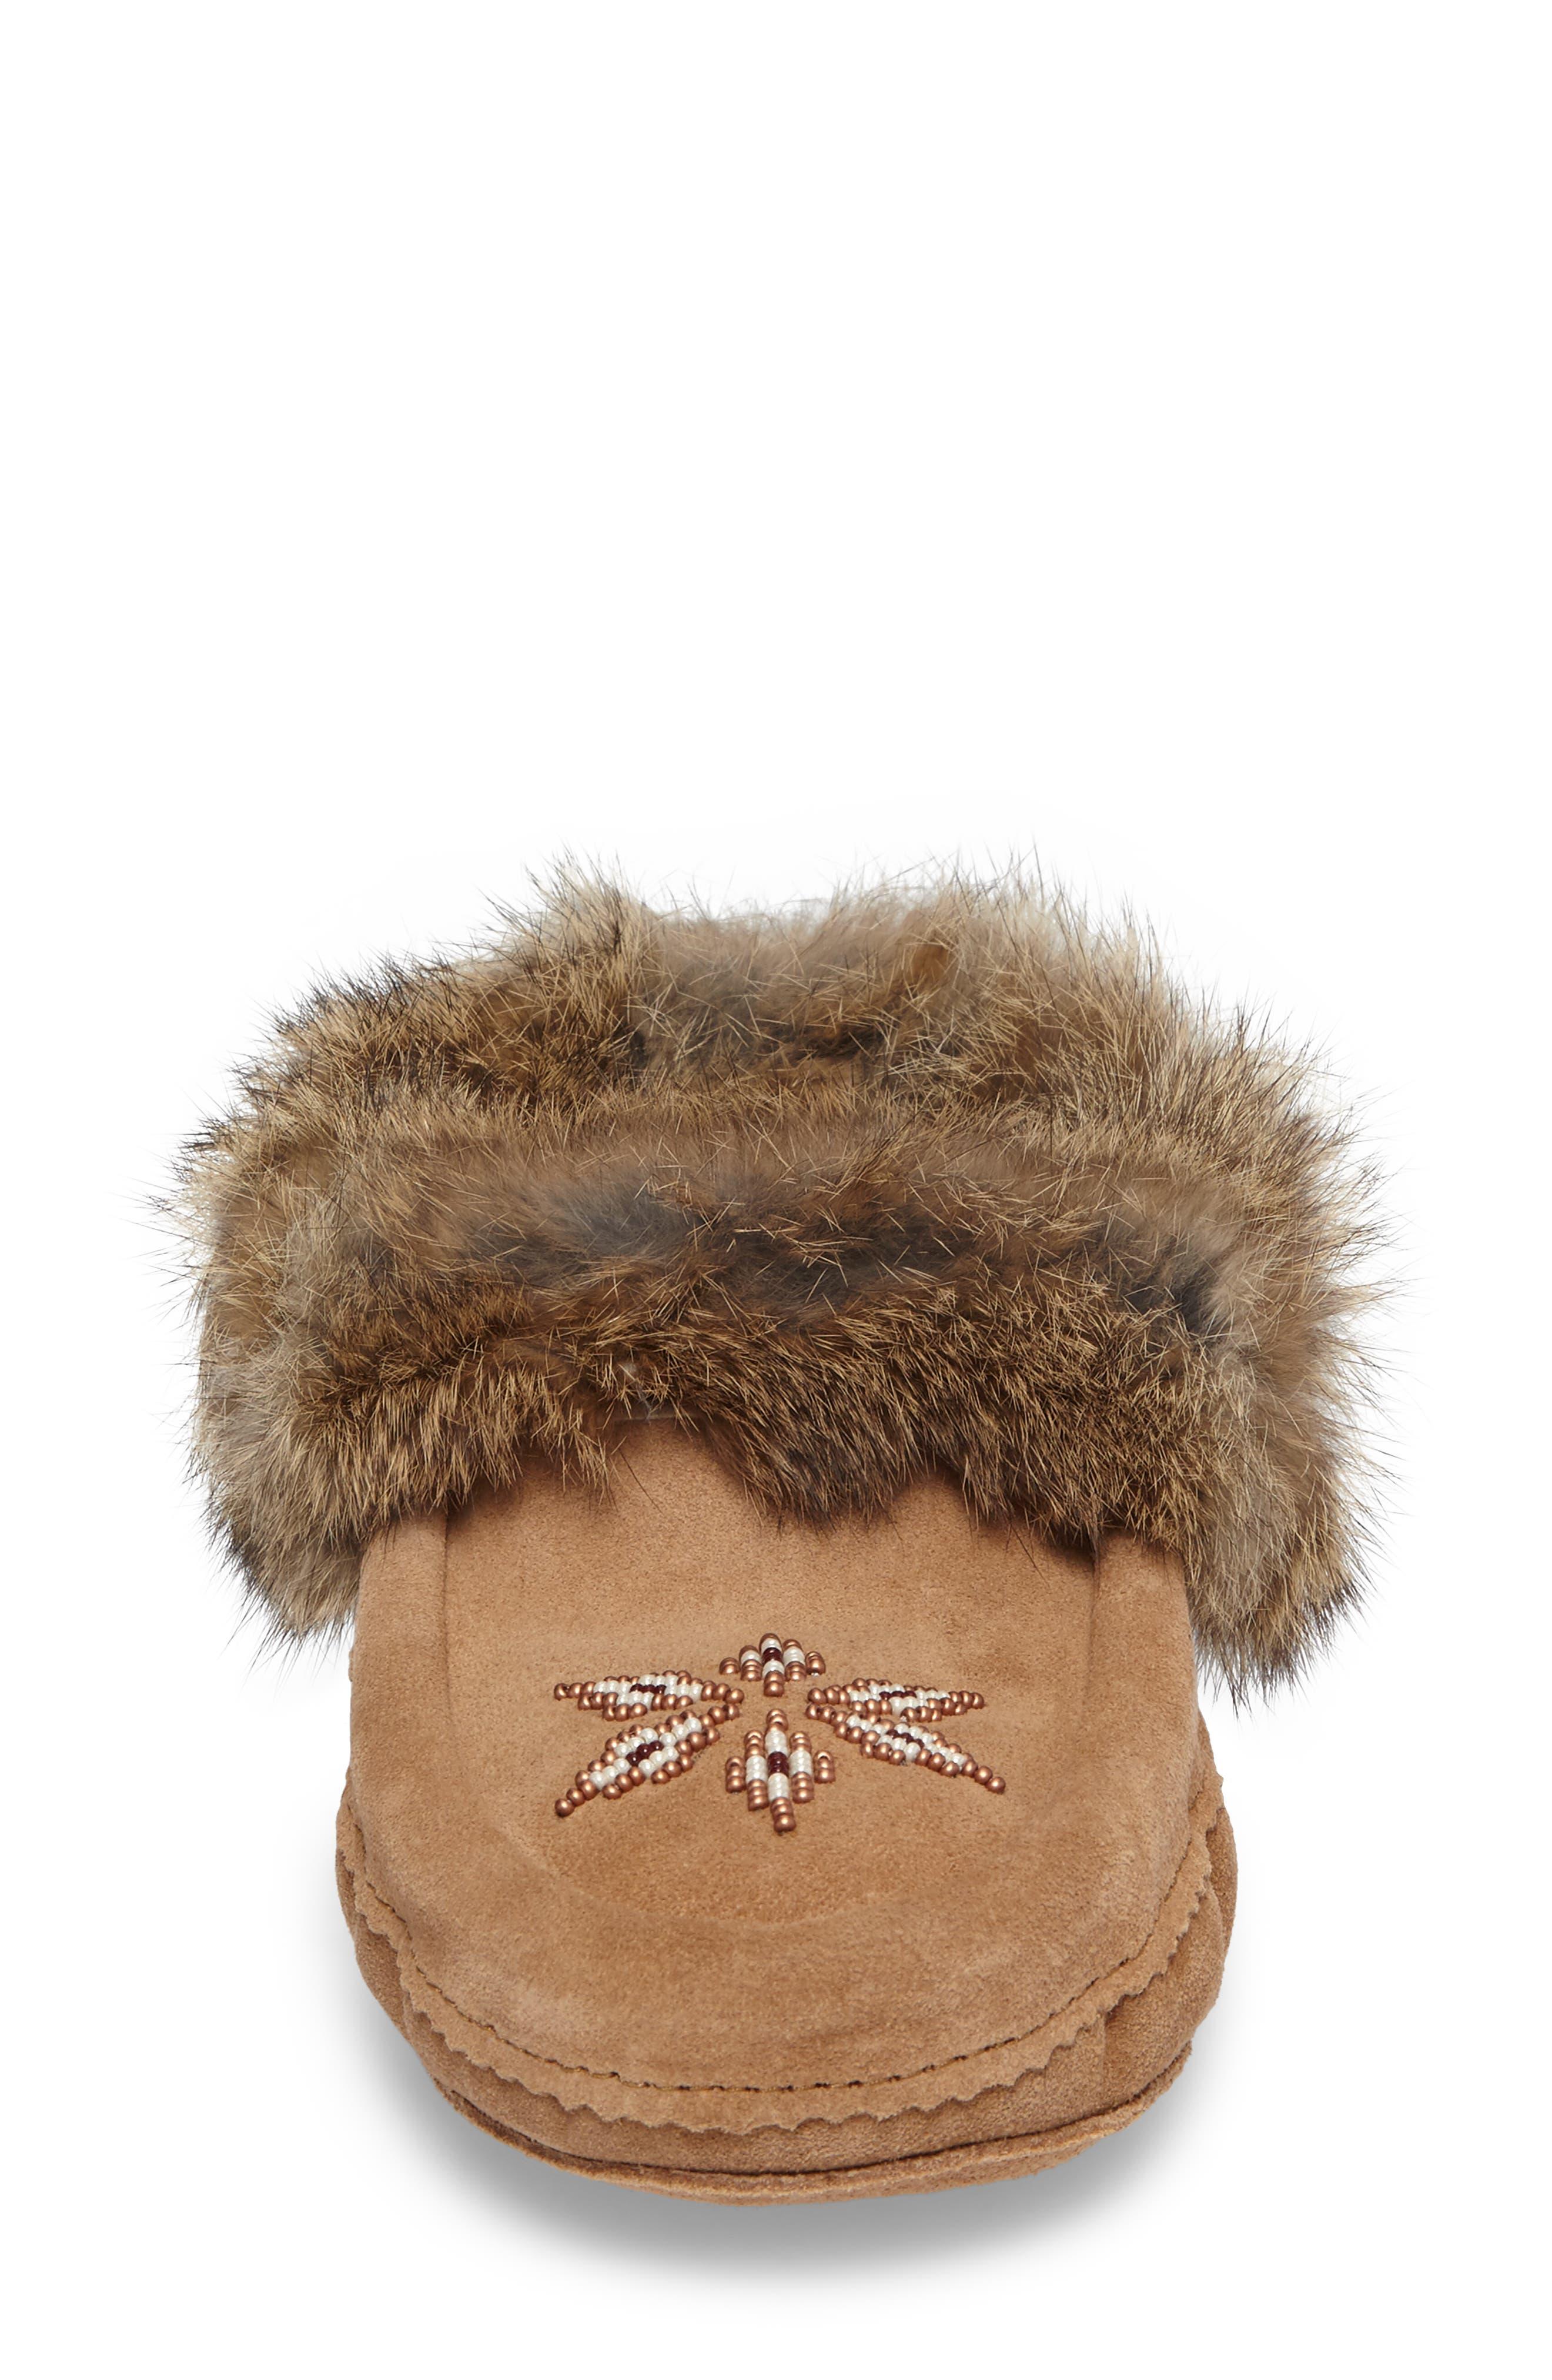 'Kanada' Genuine Rabbit Fur & Suede Moccasin Slipper,                             Alternate thumbnail 4, color,                             OAK FUR